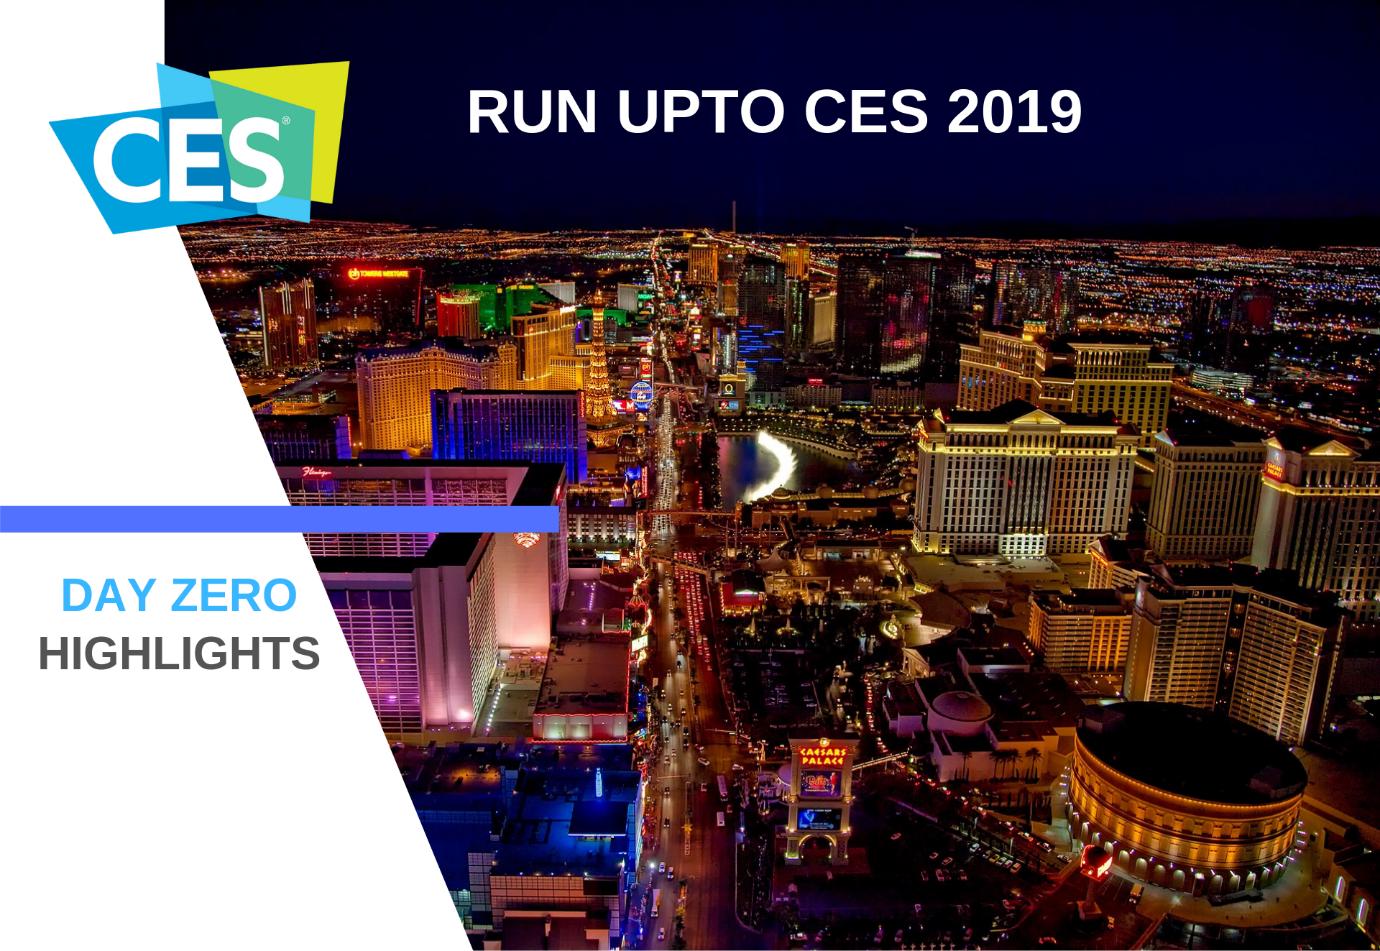 Run Upto CES 2019